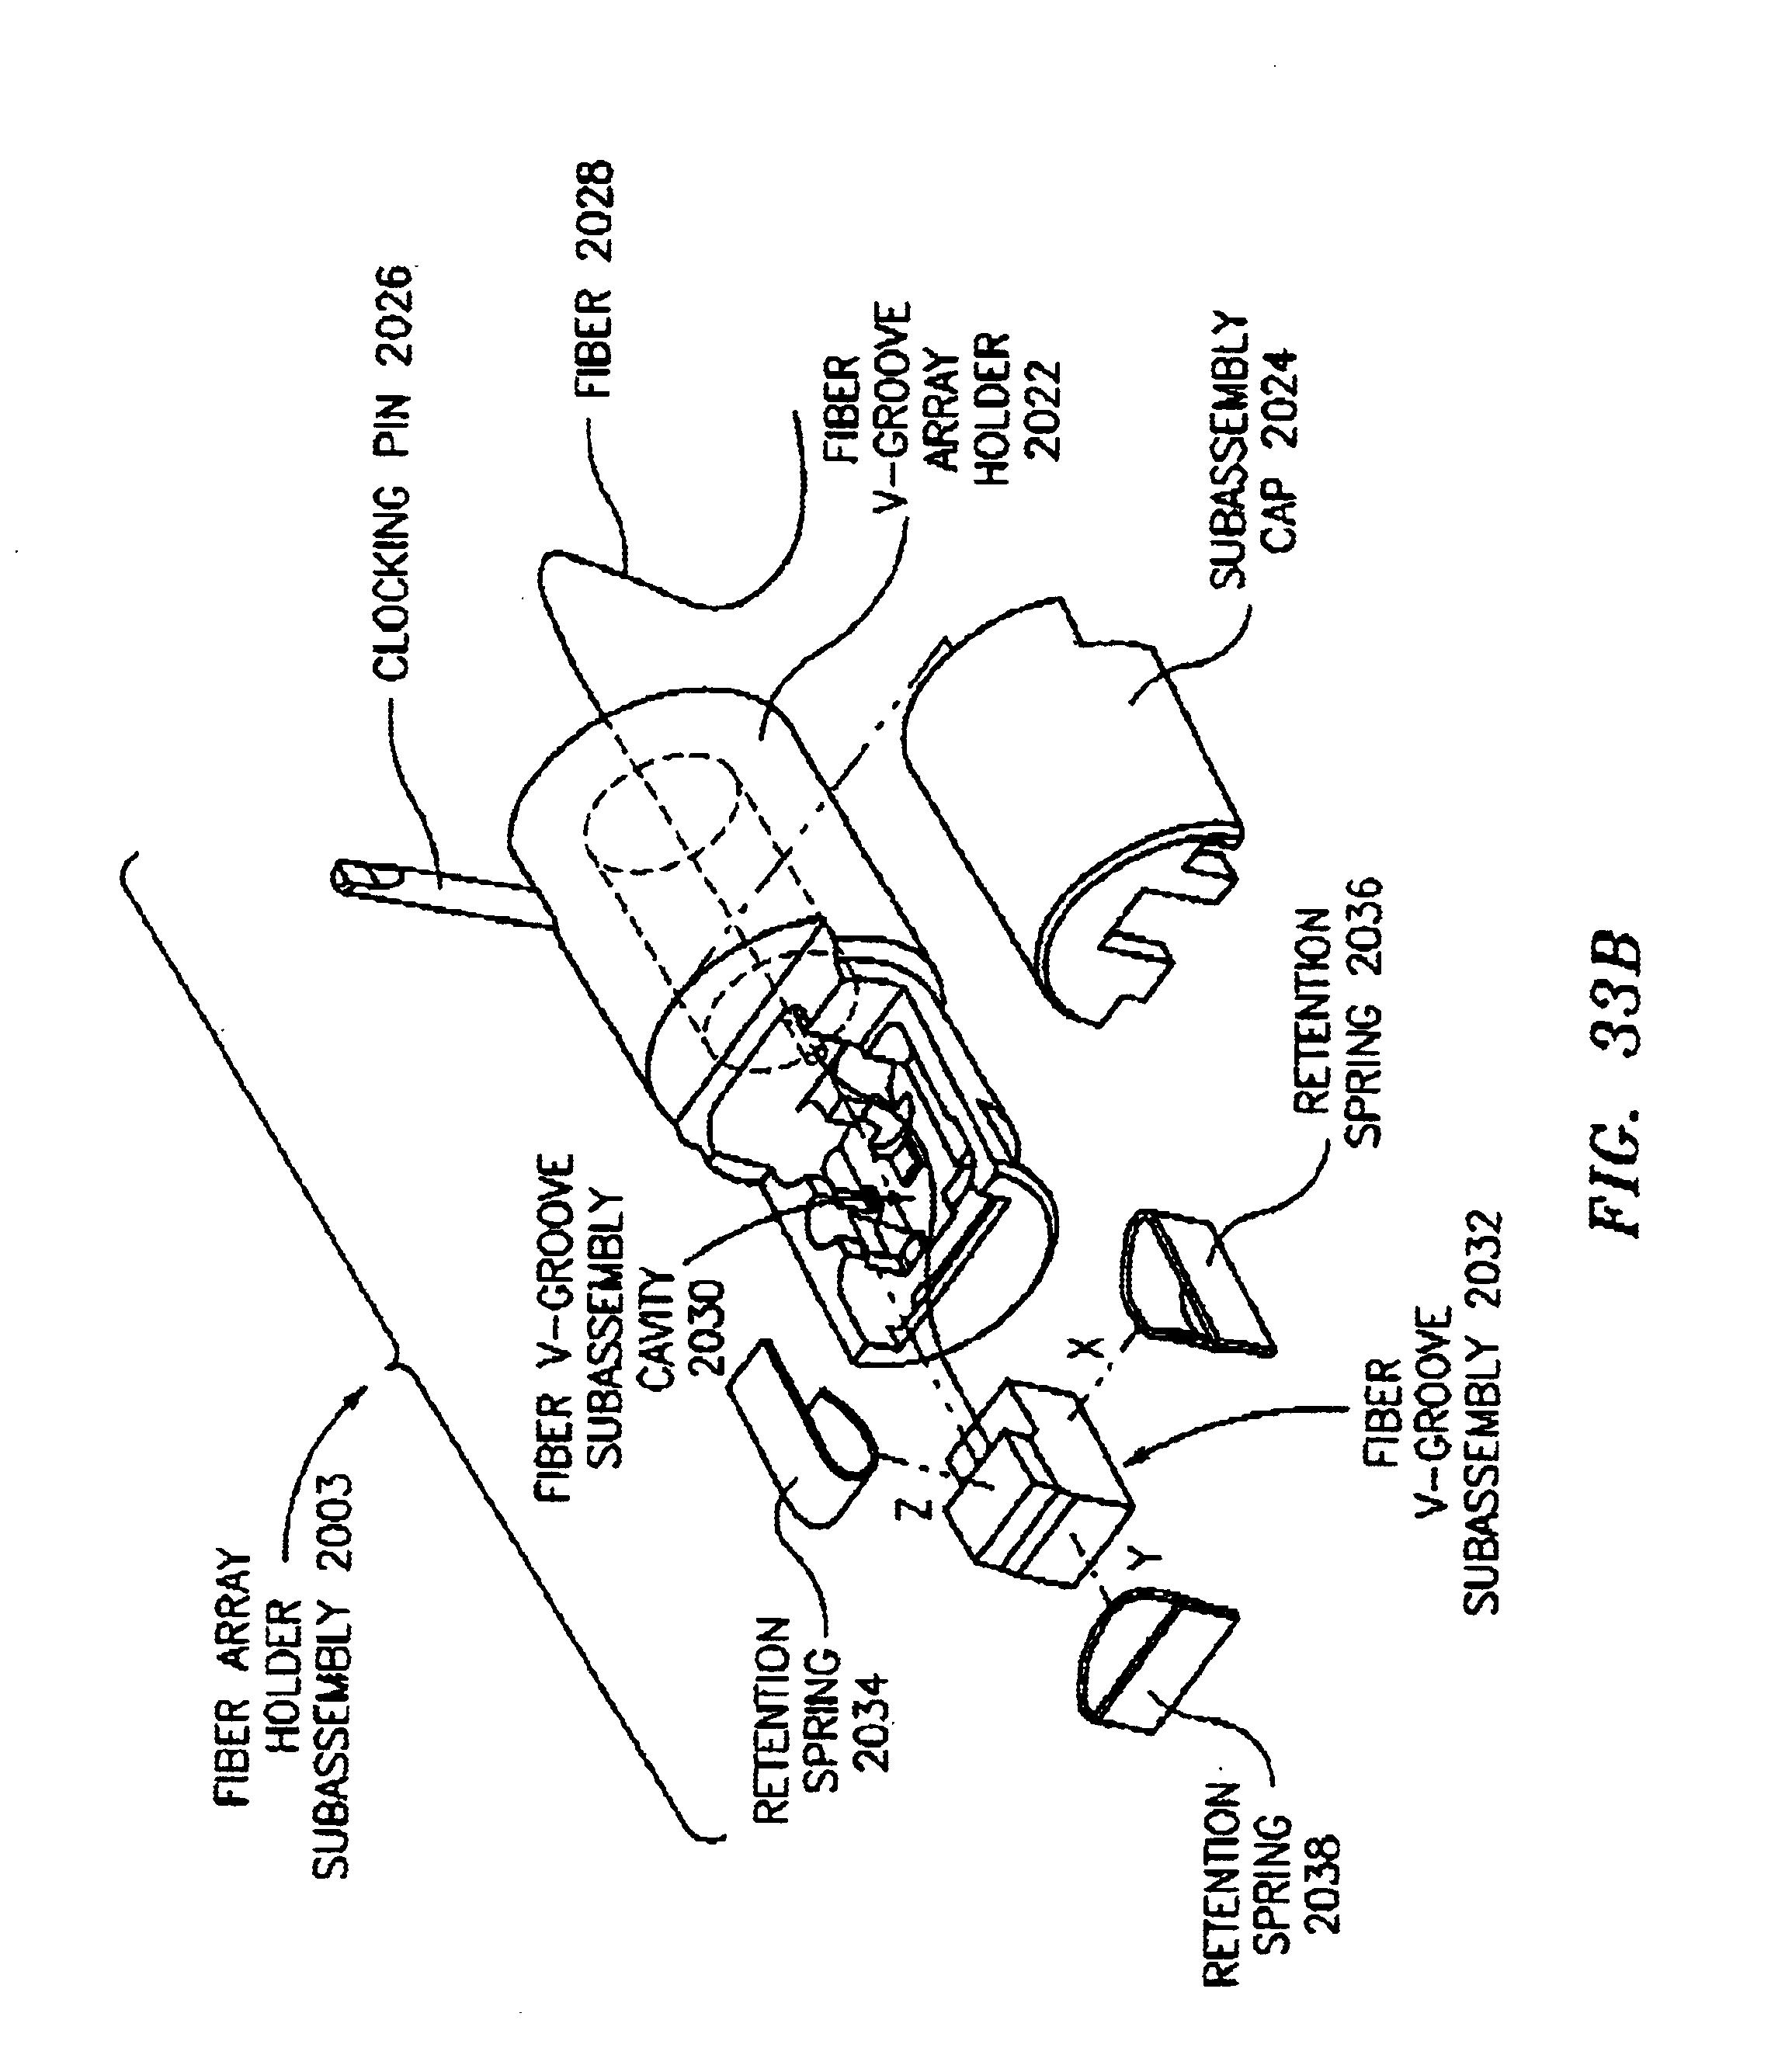 Patent US6922277 - Optical interleaver/deinterleaver device having